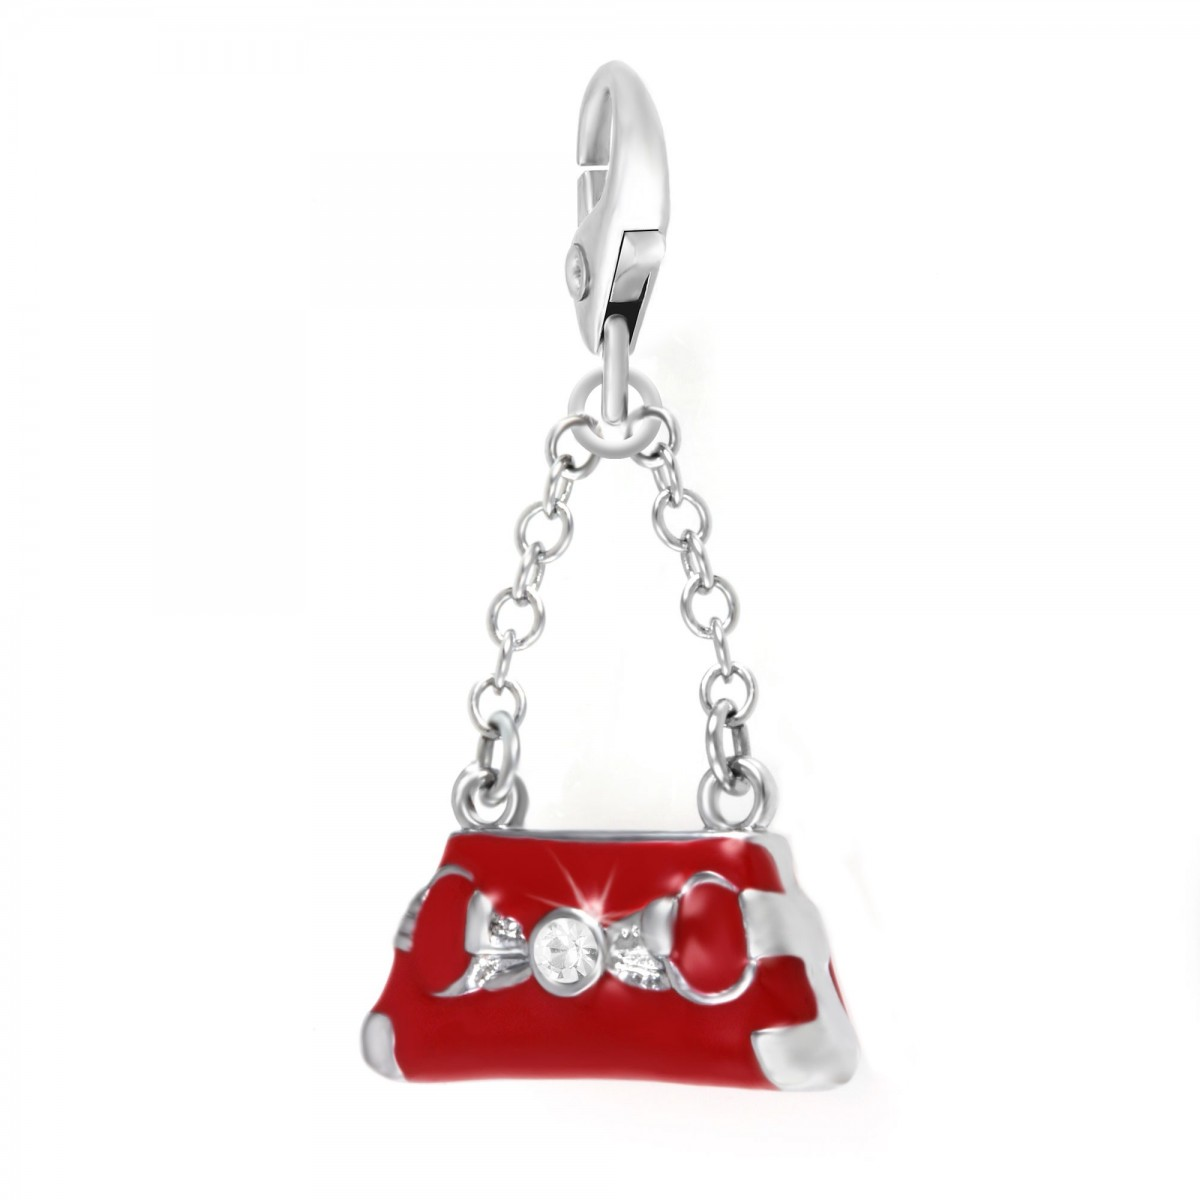 Charm sac à main So Charm made with Crystal from Swarovski